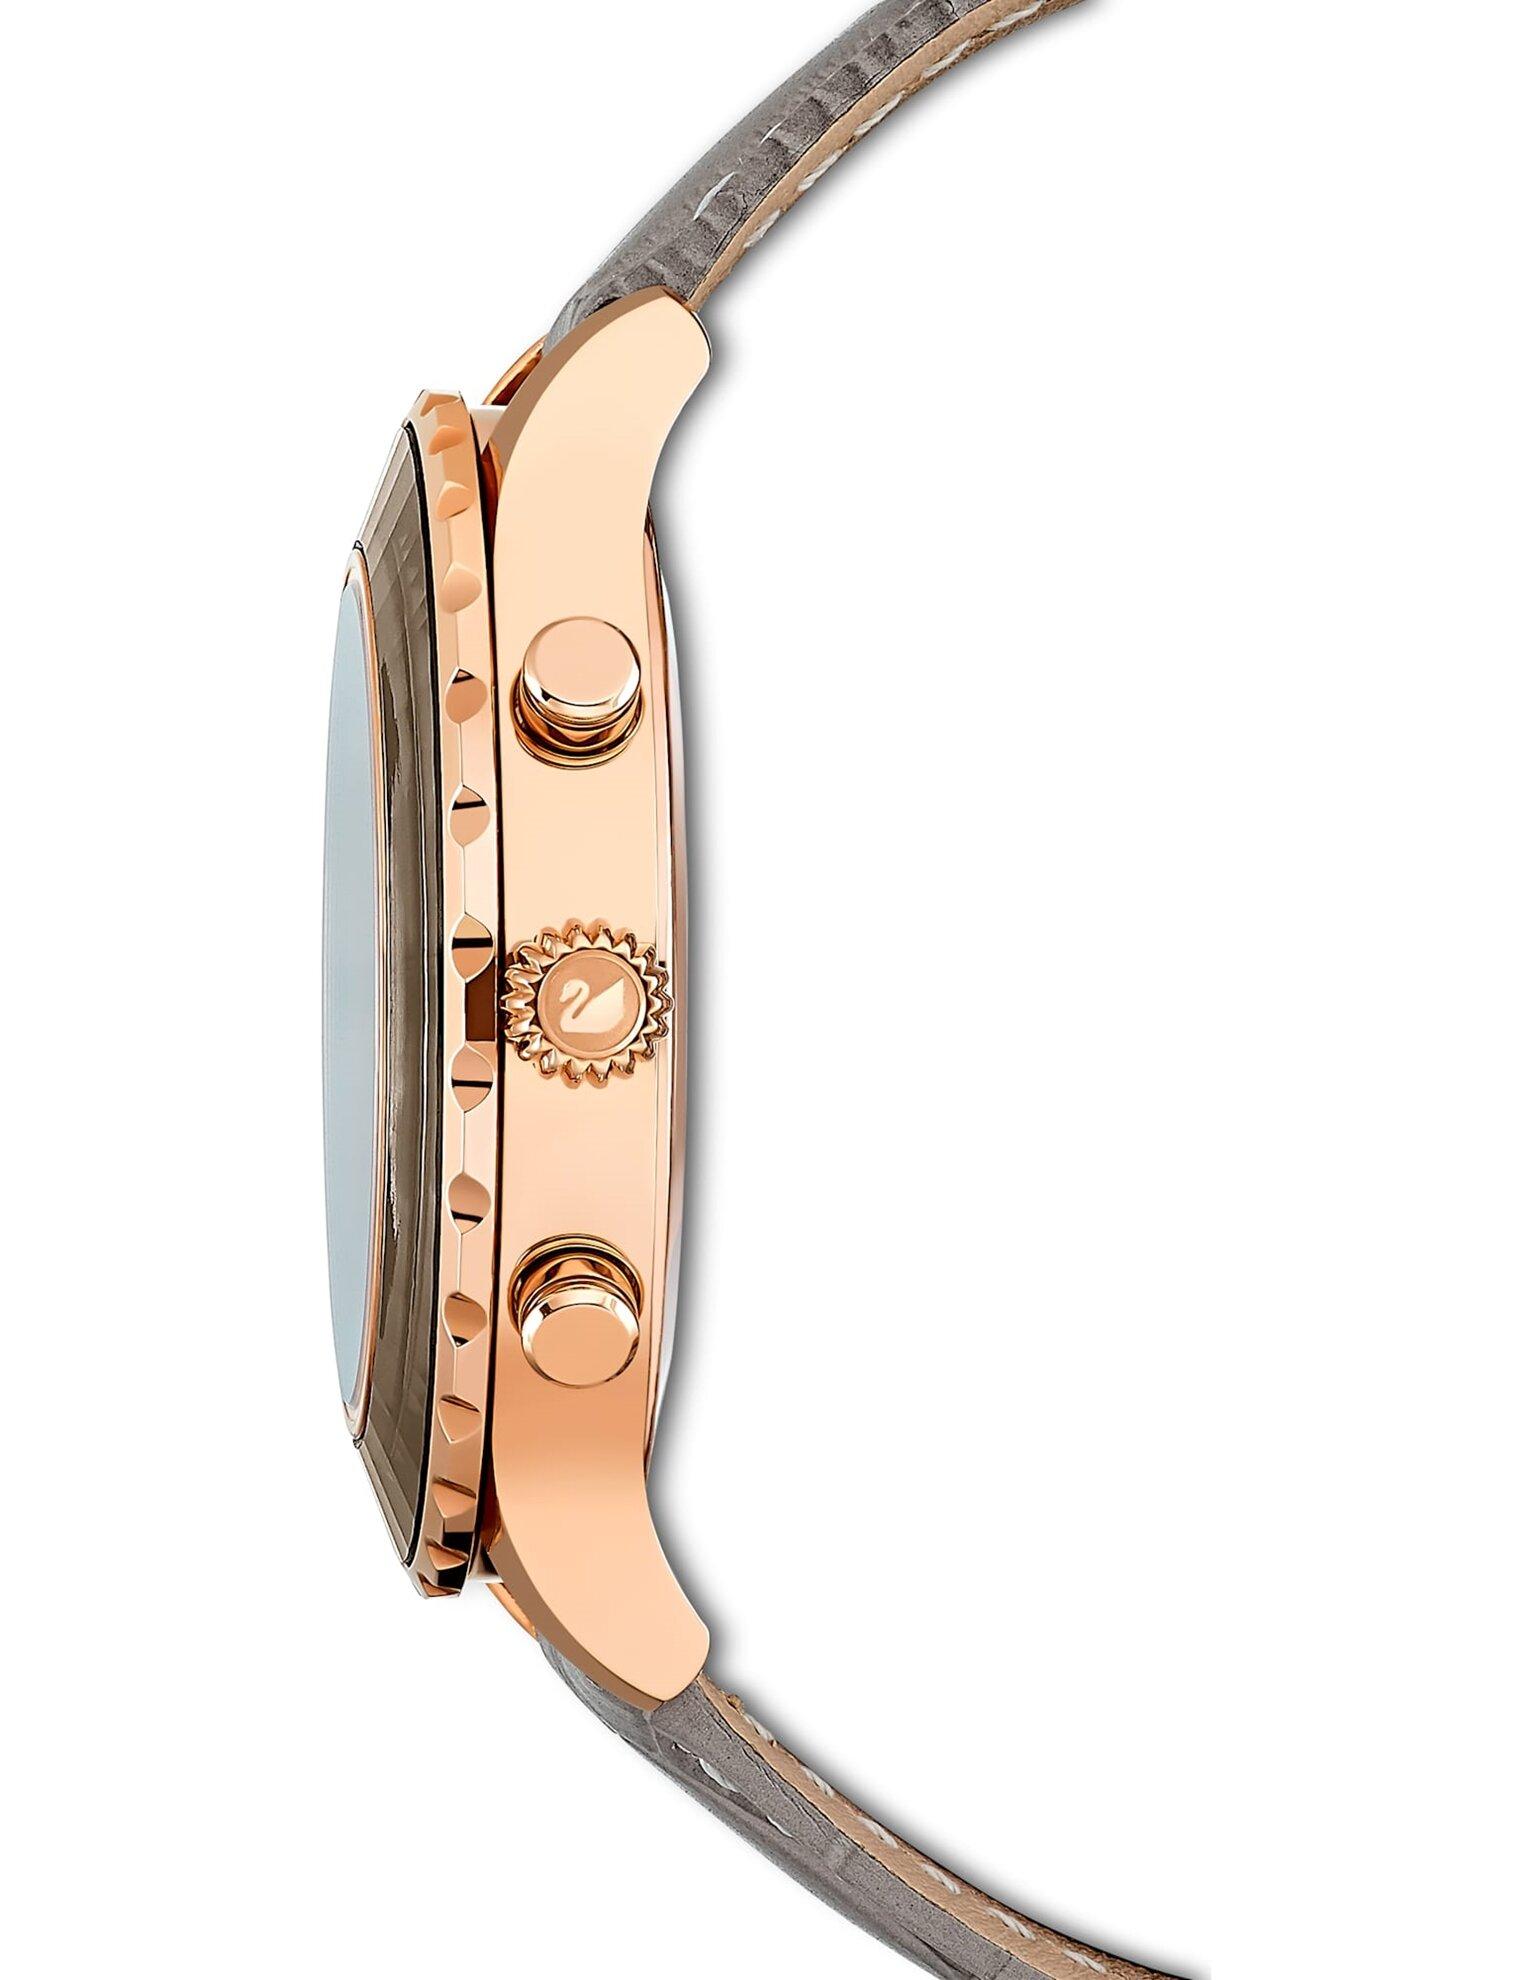 Picture of Octea Lux Chrono Saat, Deri kayış, Gri, Pembe altın rengi PVD